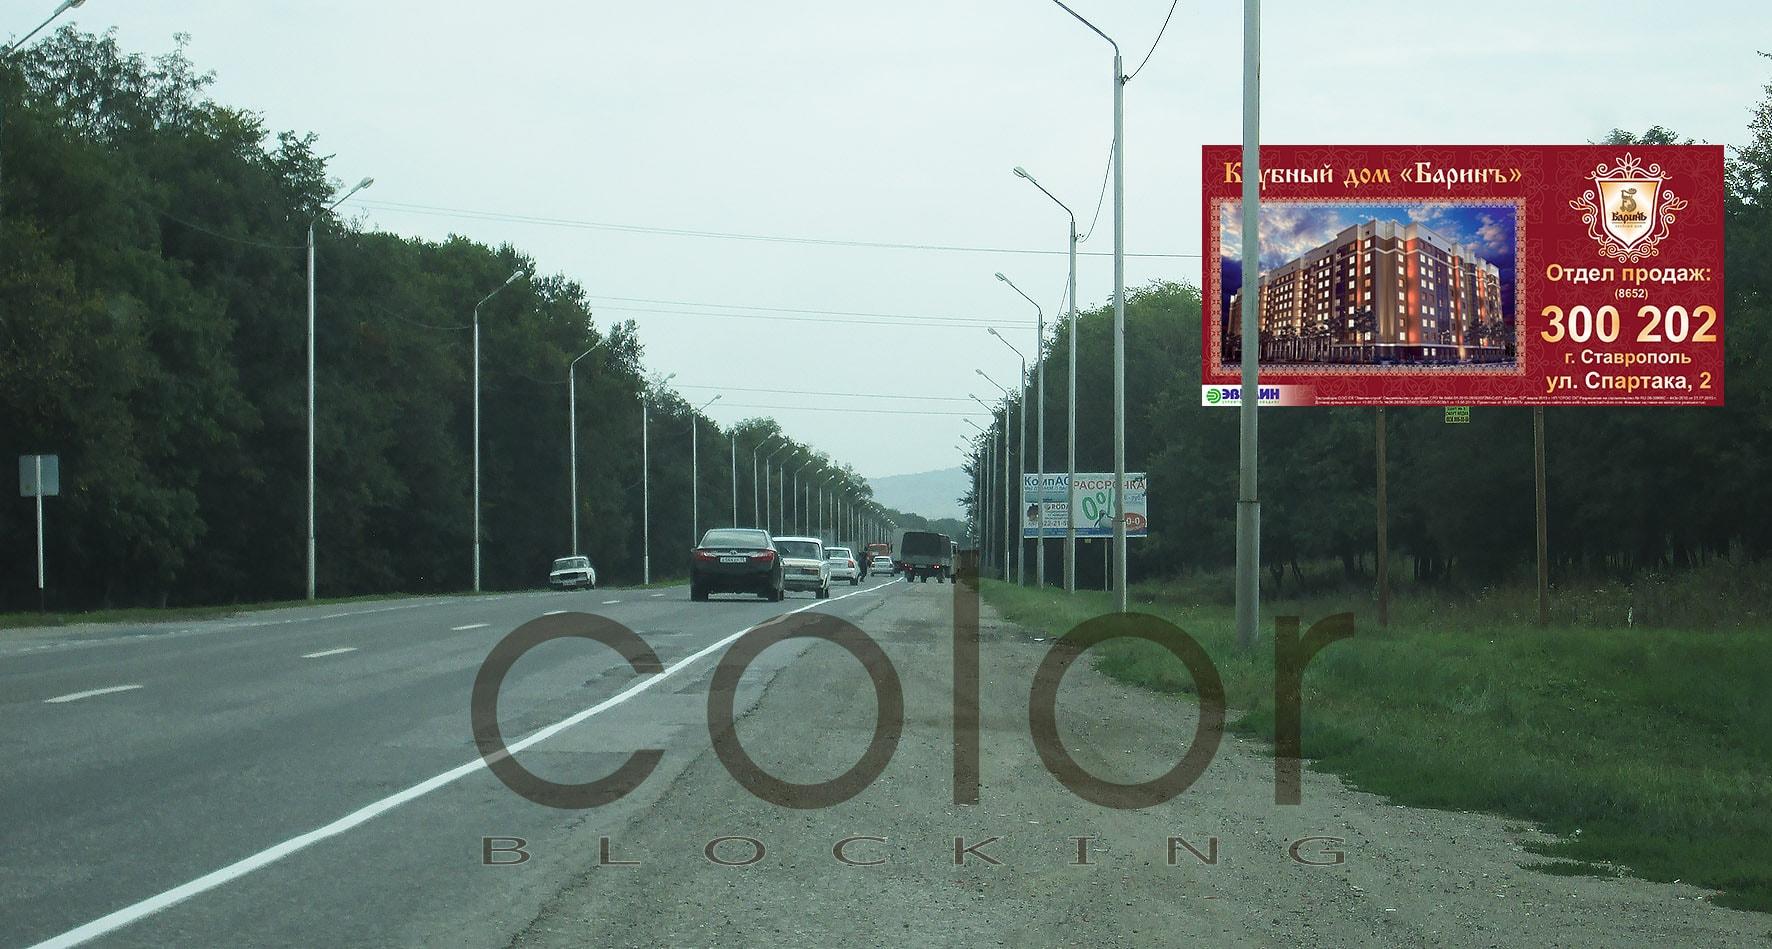 Наружная реклама в Чечне билборды